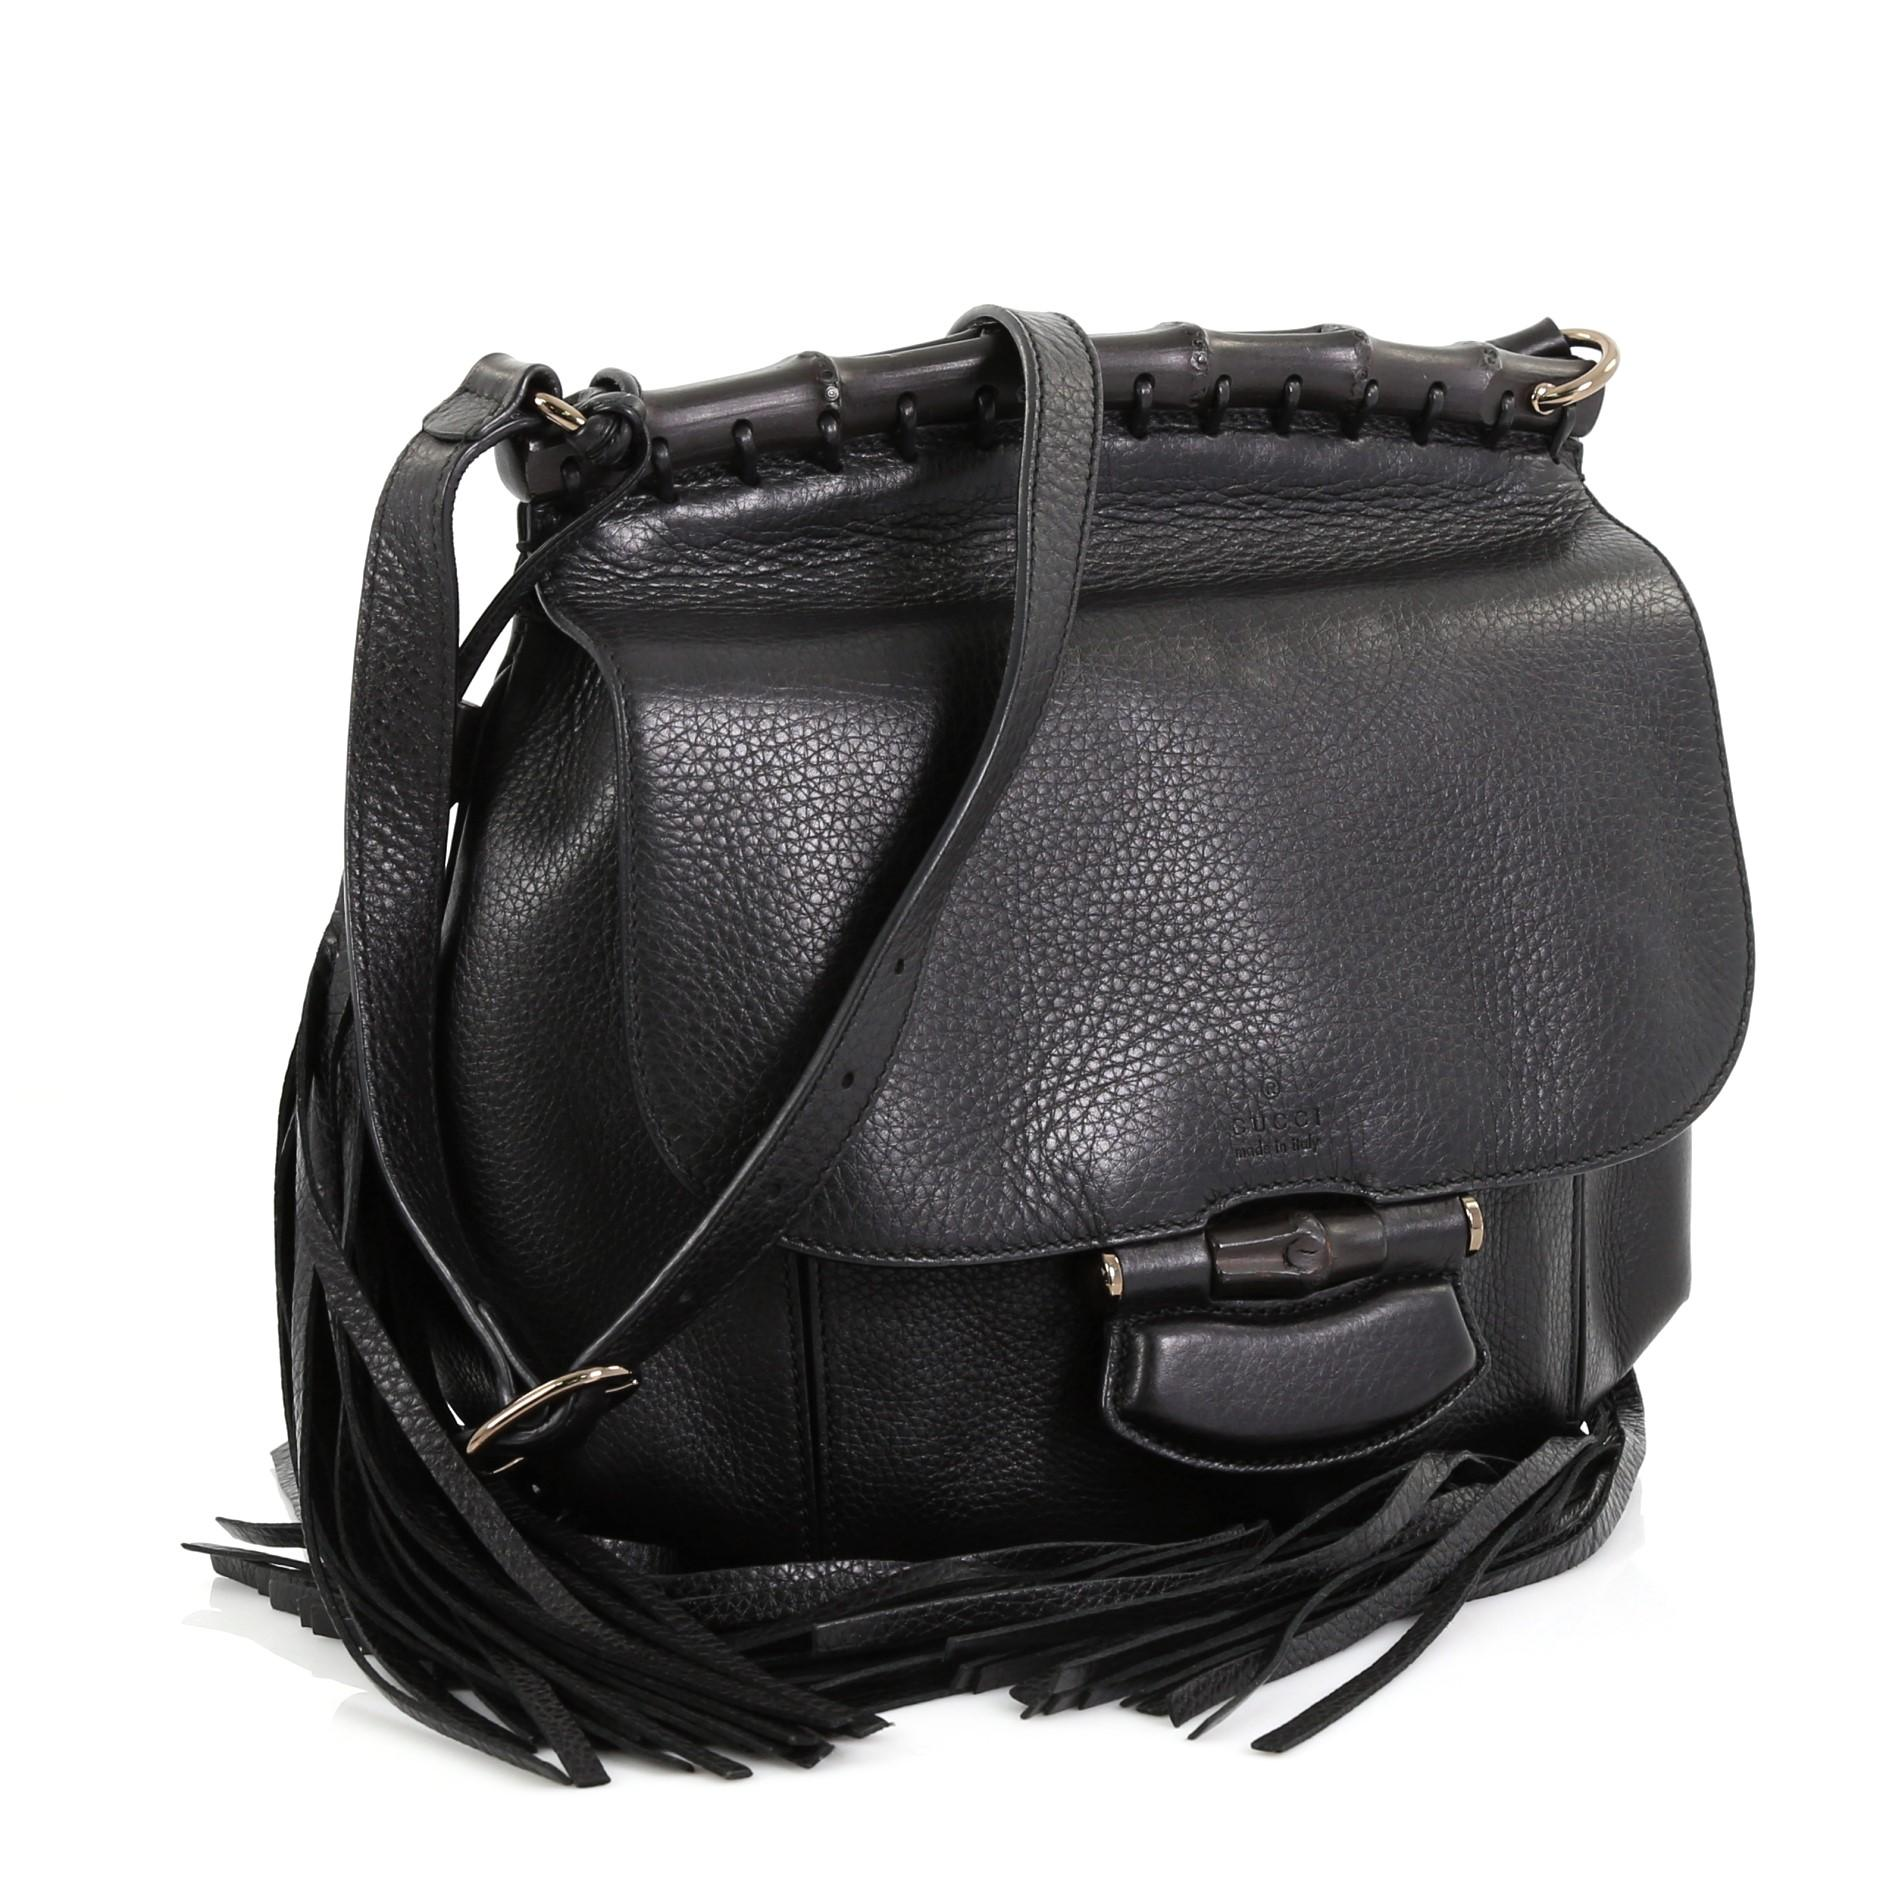 8fd746453 Gucci Nouveau Fringe Crossbody Bag Leather Medium at 1stdibs